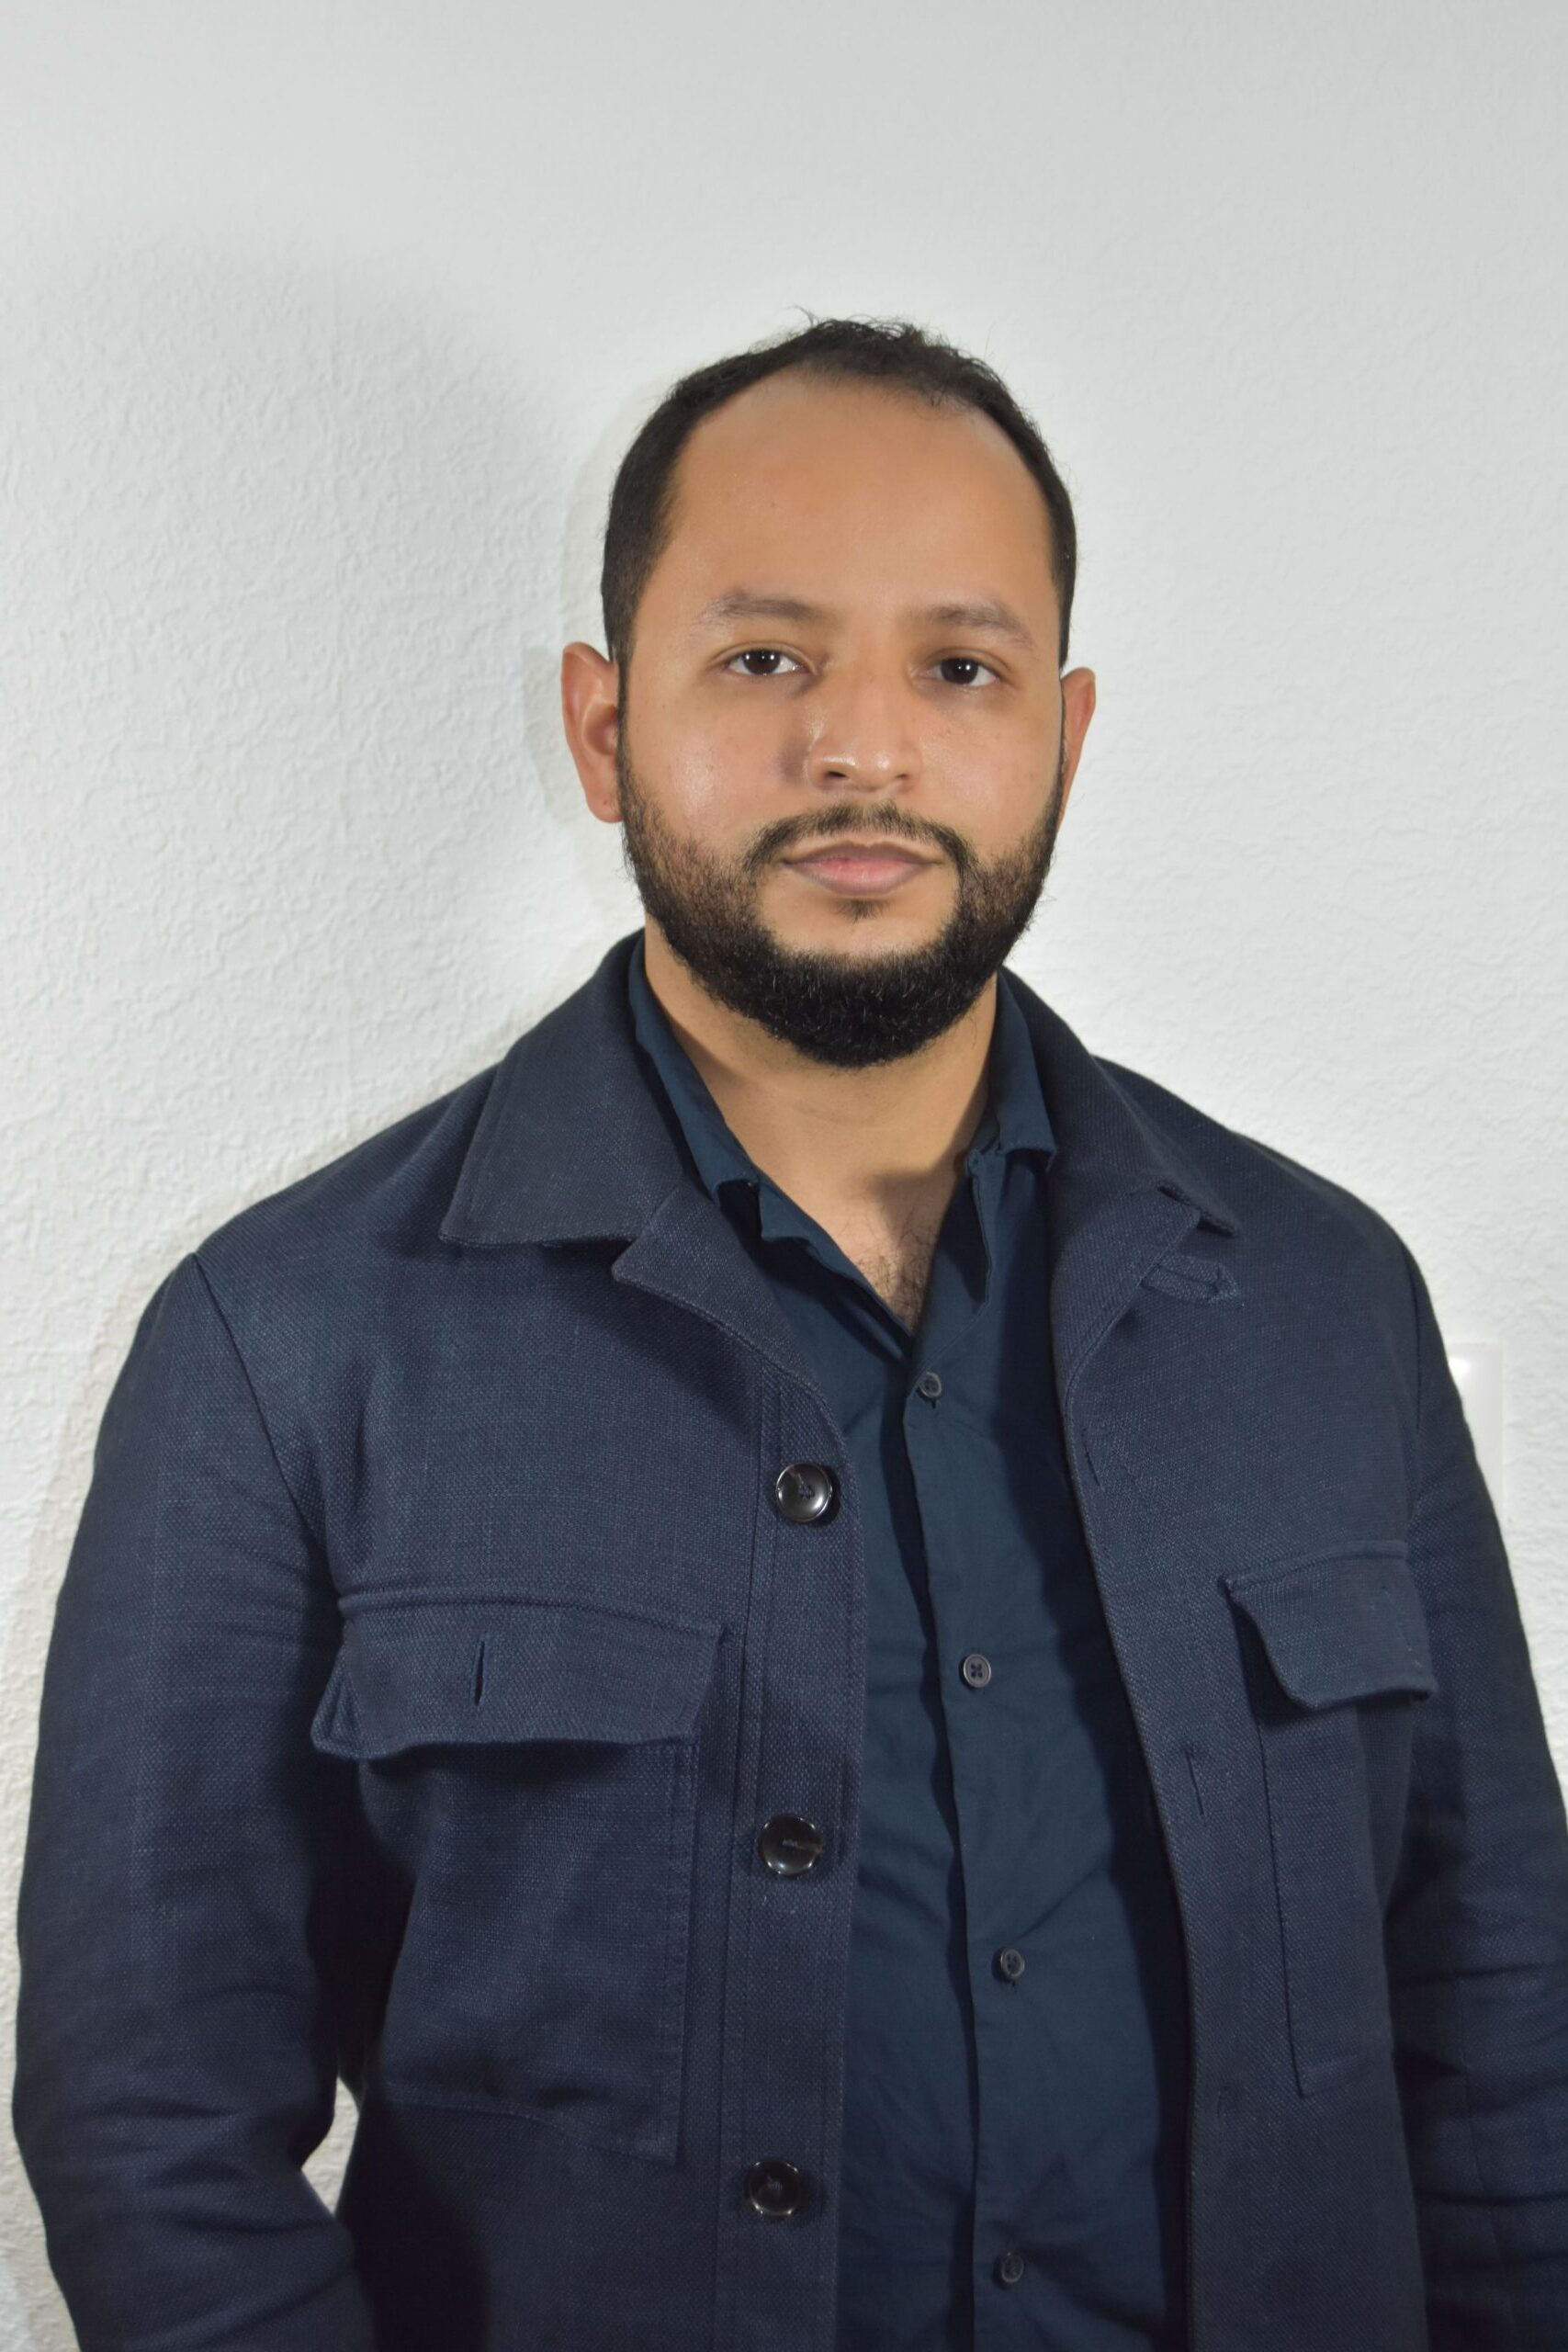 Elvis Ruiz